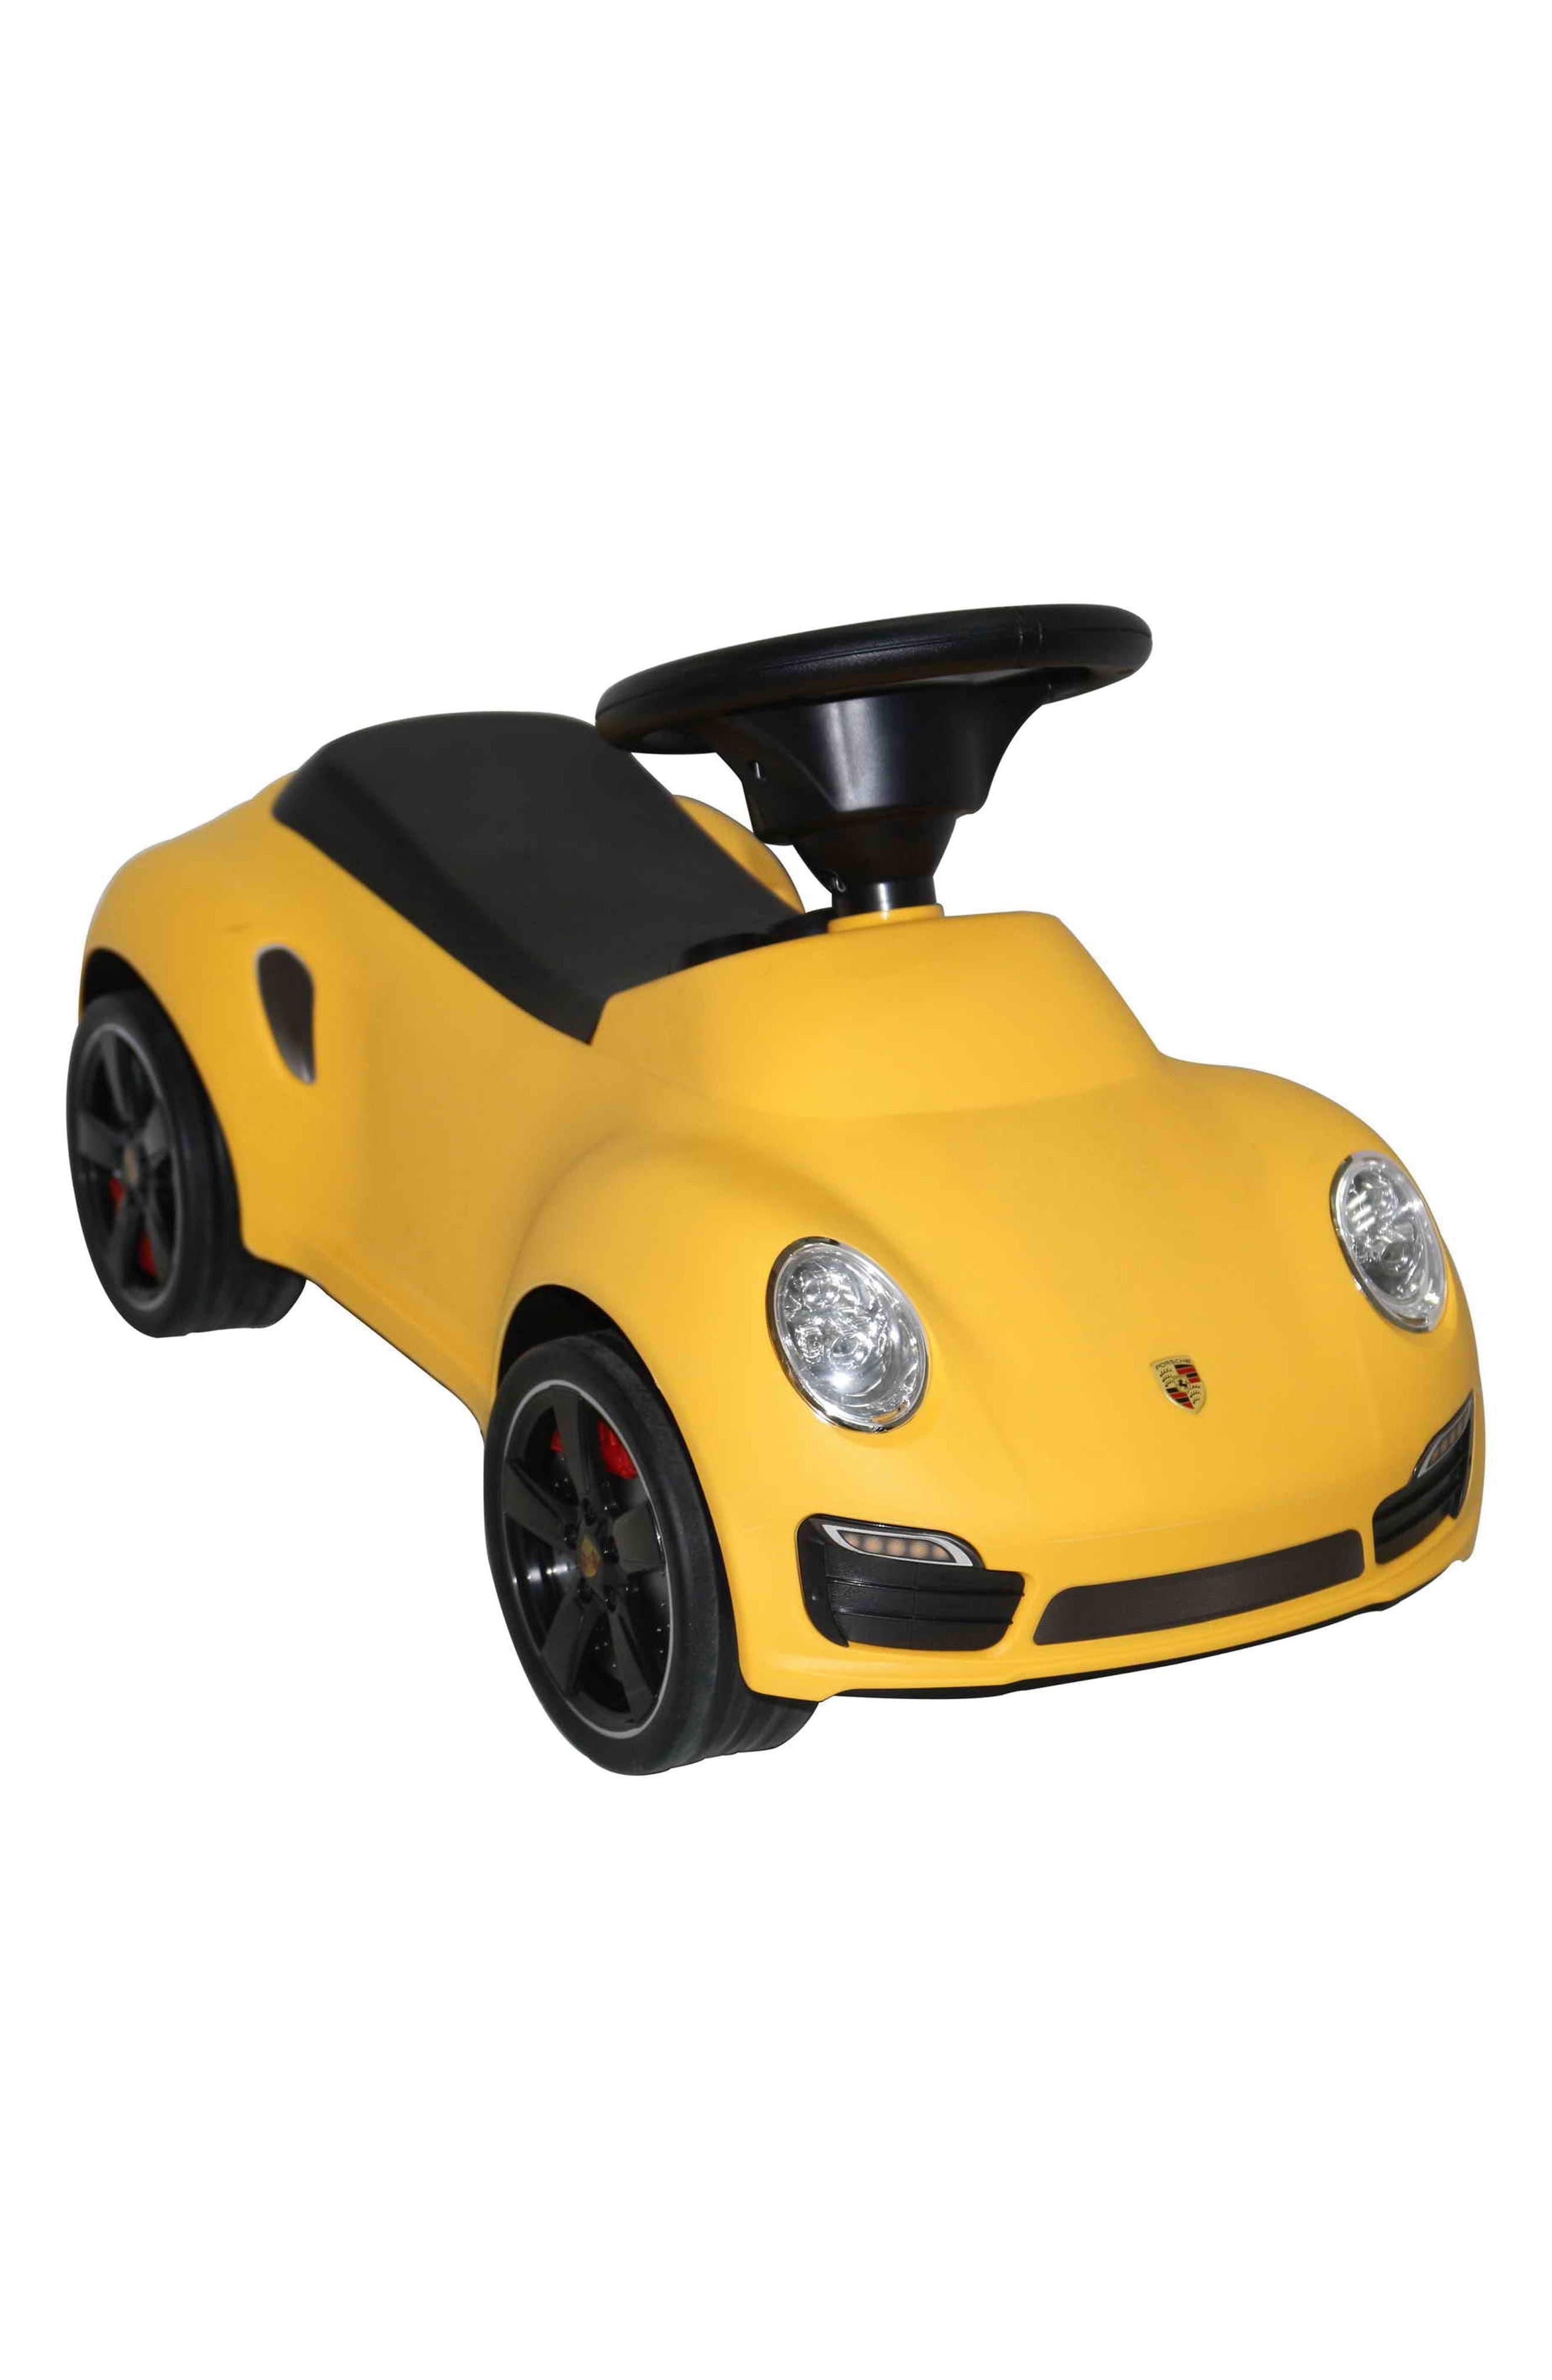 Best Ride on Cars Porsche Turbo 911 Ride-On Push Car